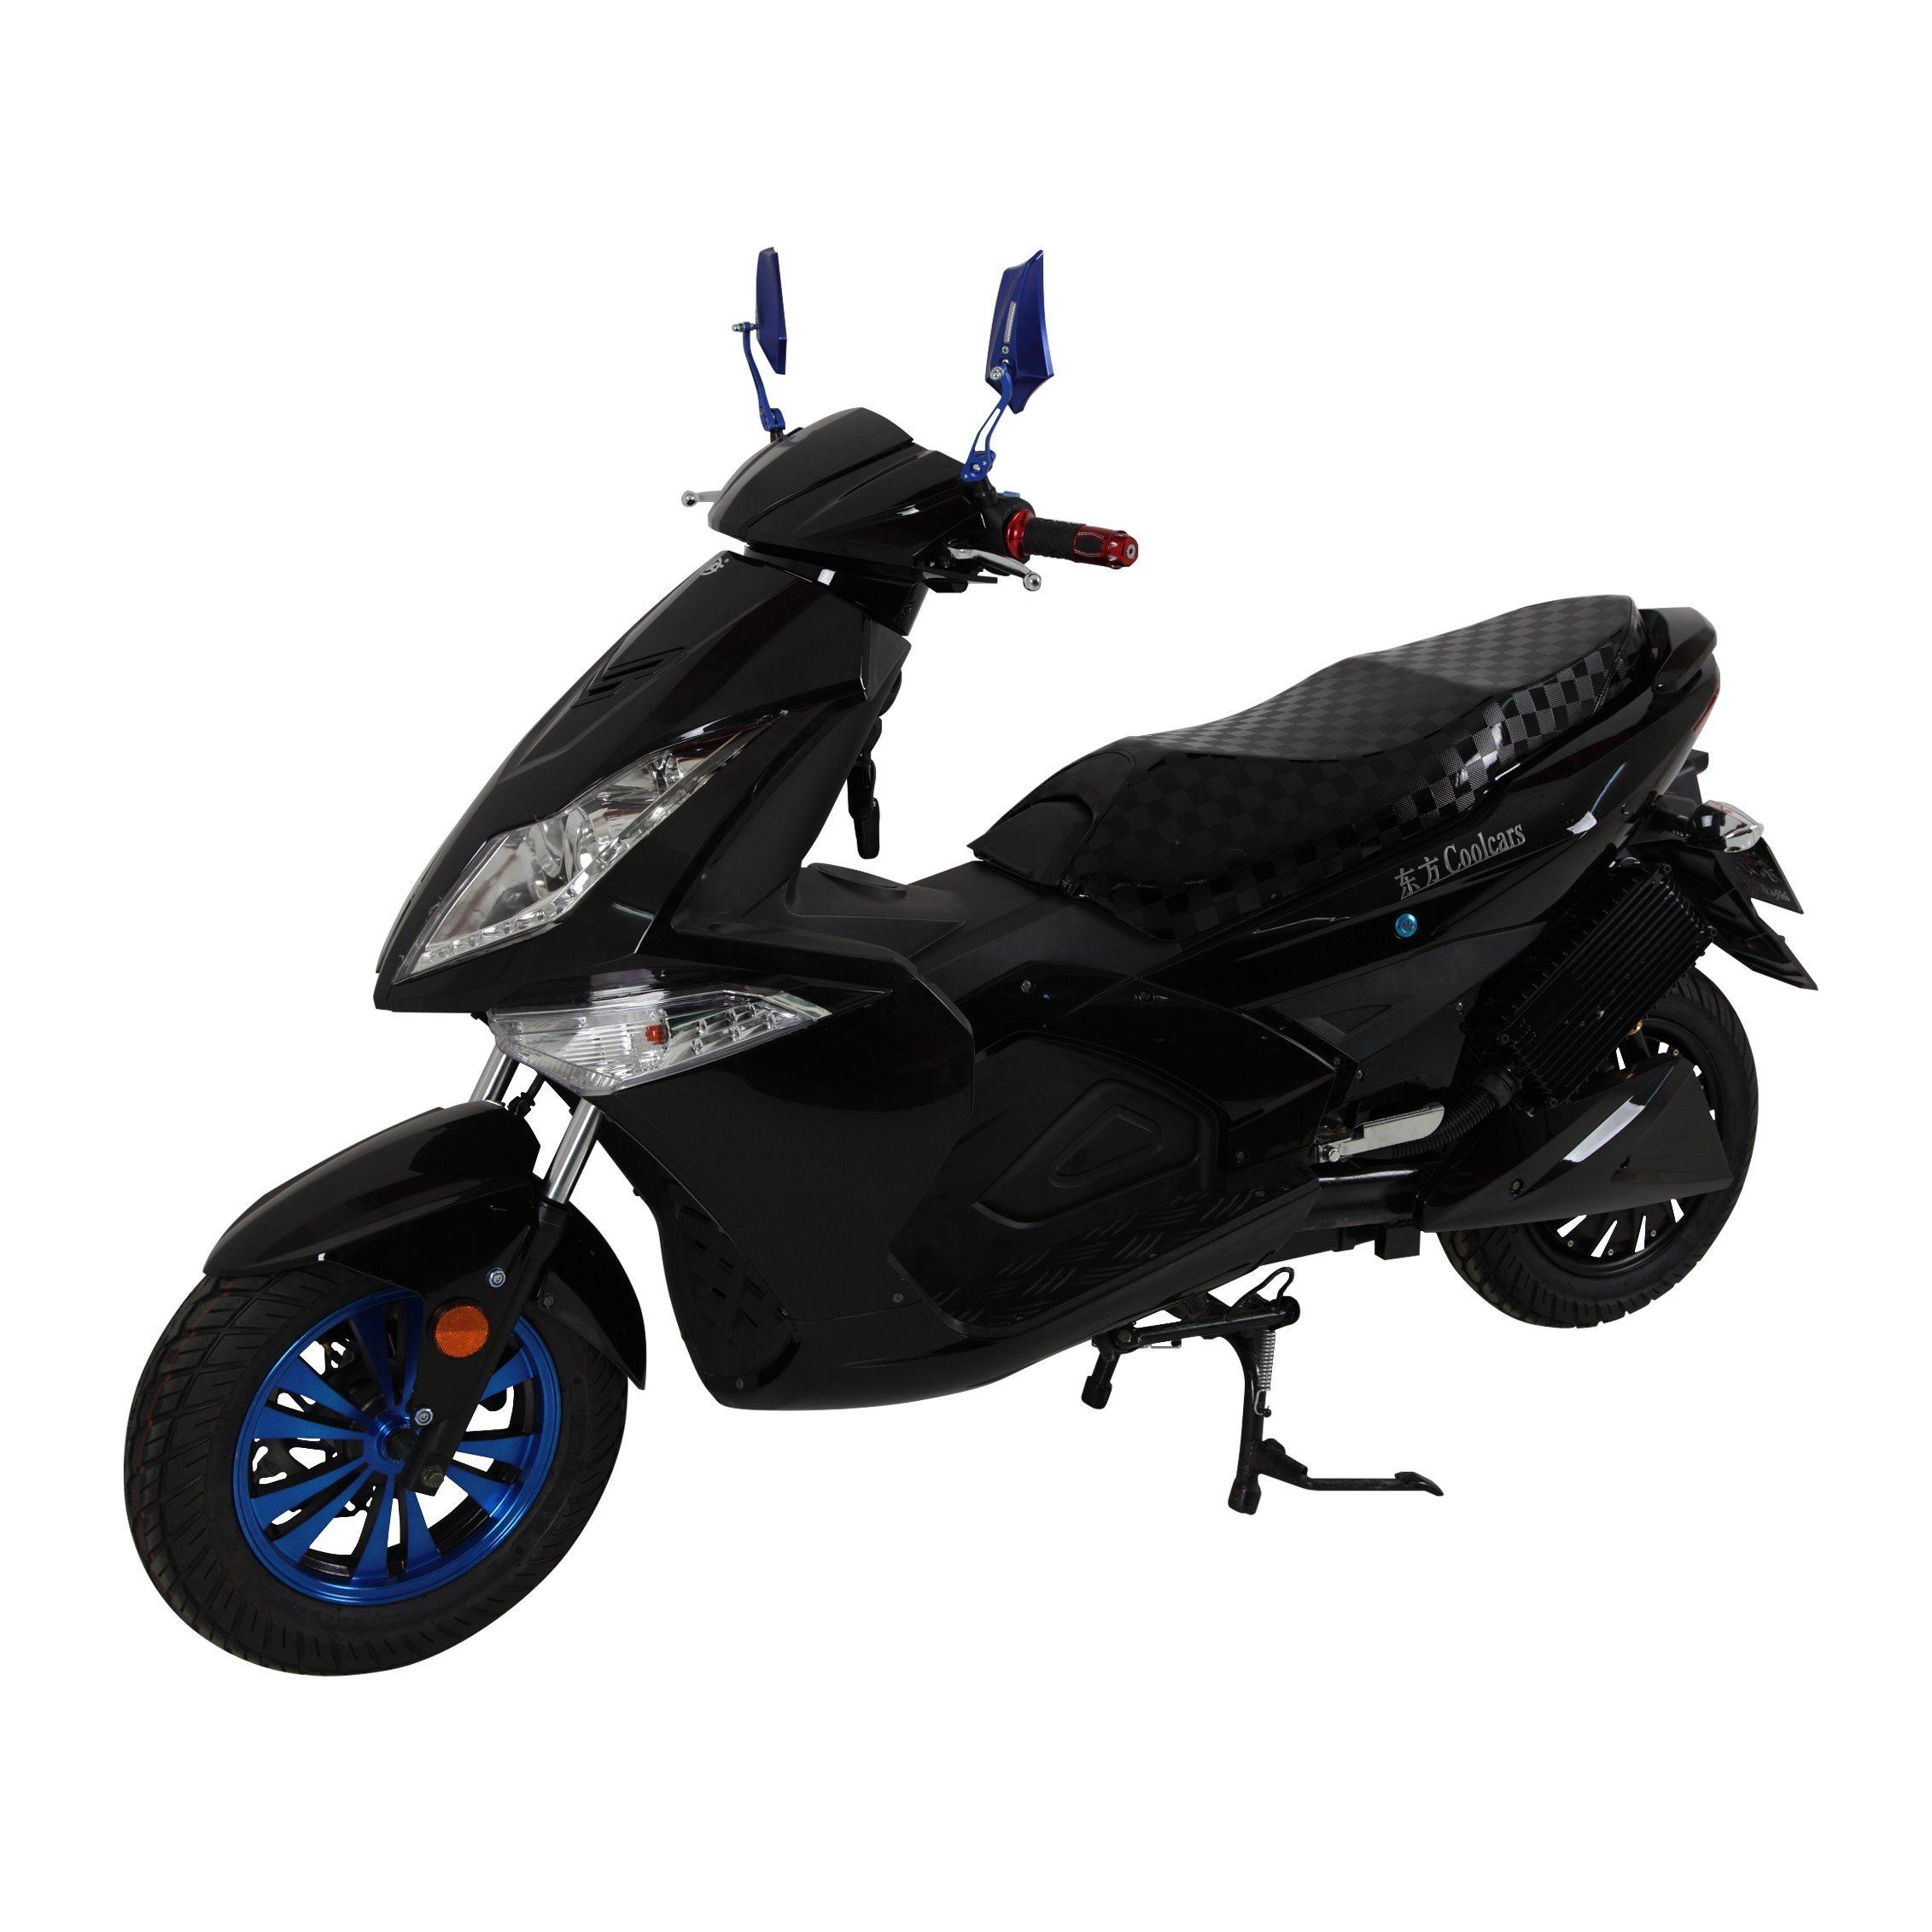 2000watt Fast Speed Electric Racing Scooter Motorbike